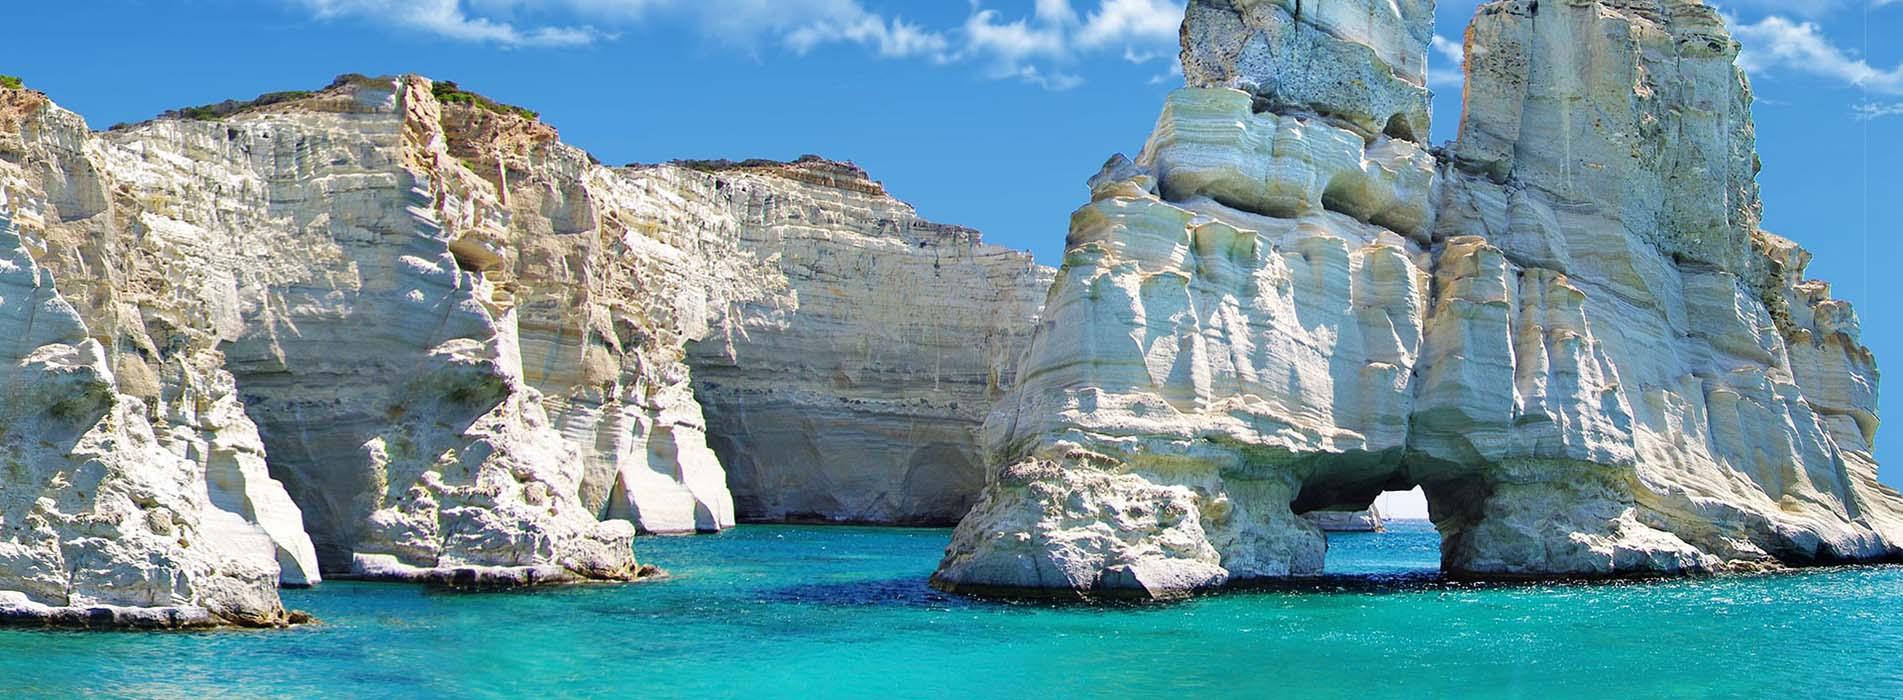 Greece - Milos 3 (main)